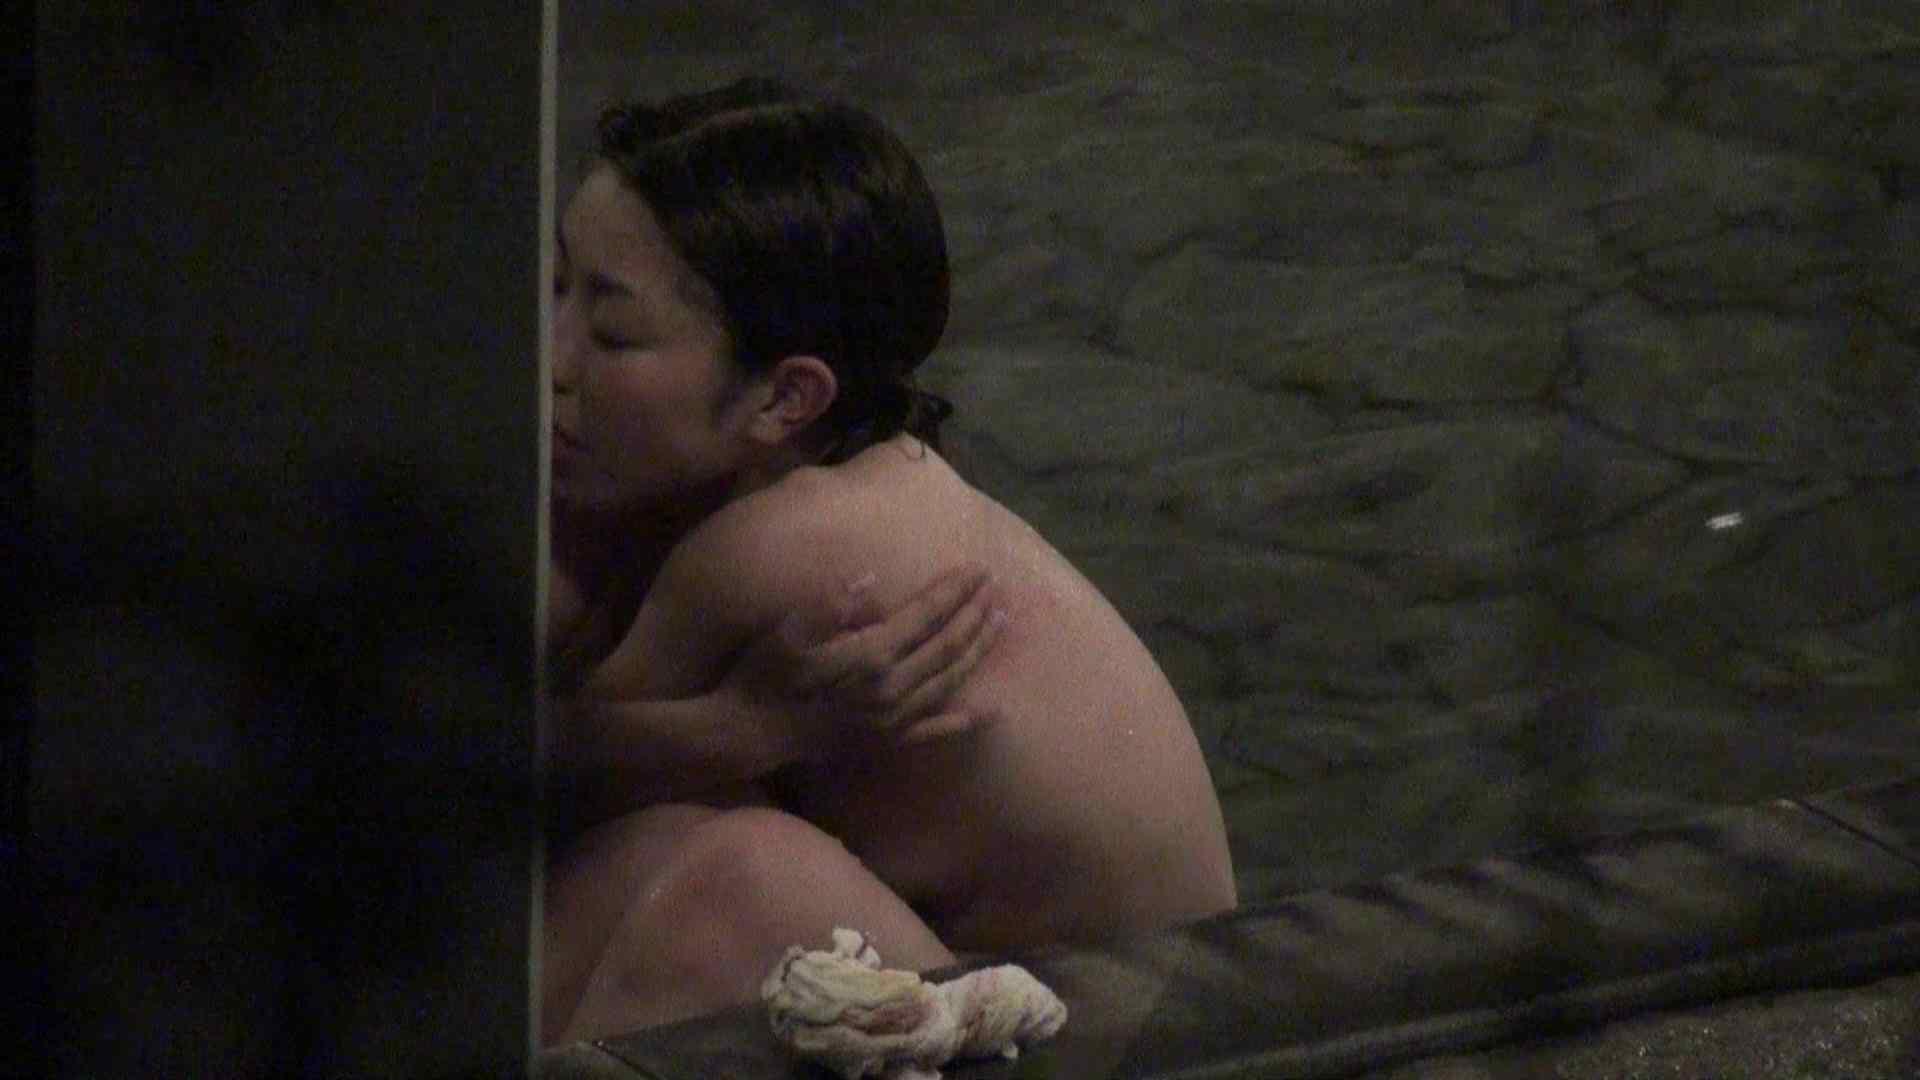 Aquaな露天風呂Vol.330 OLのエロ生活 | 露天風呂  101連発 49